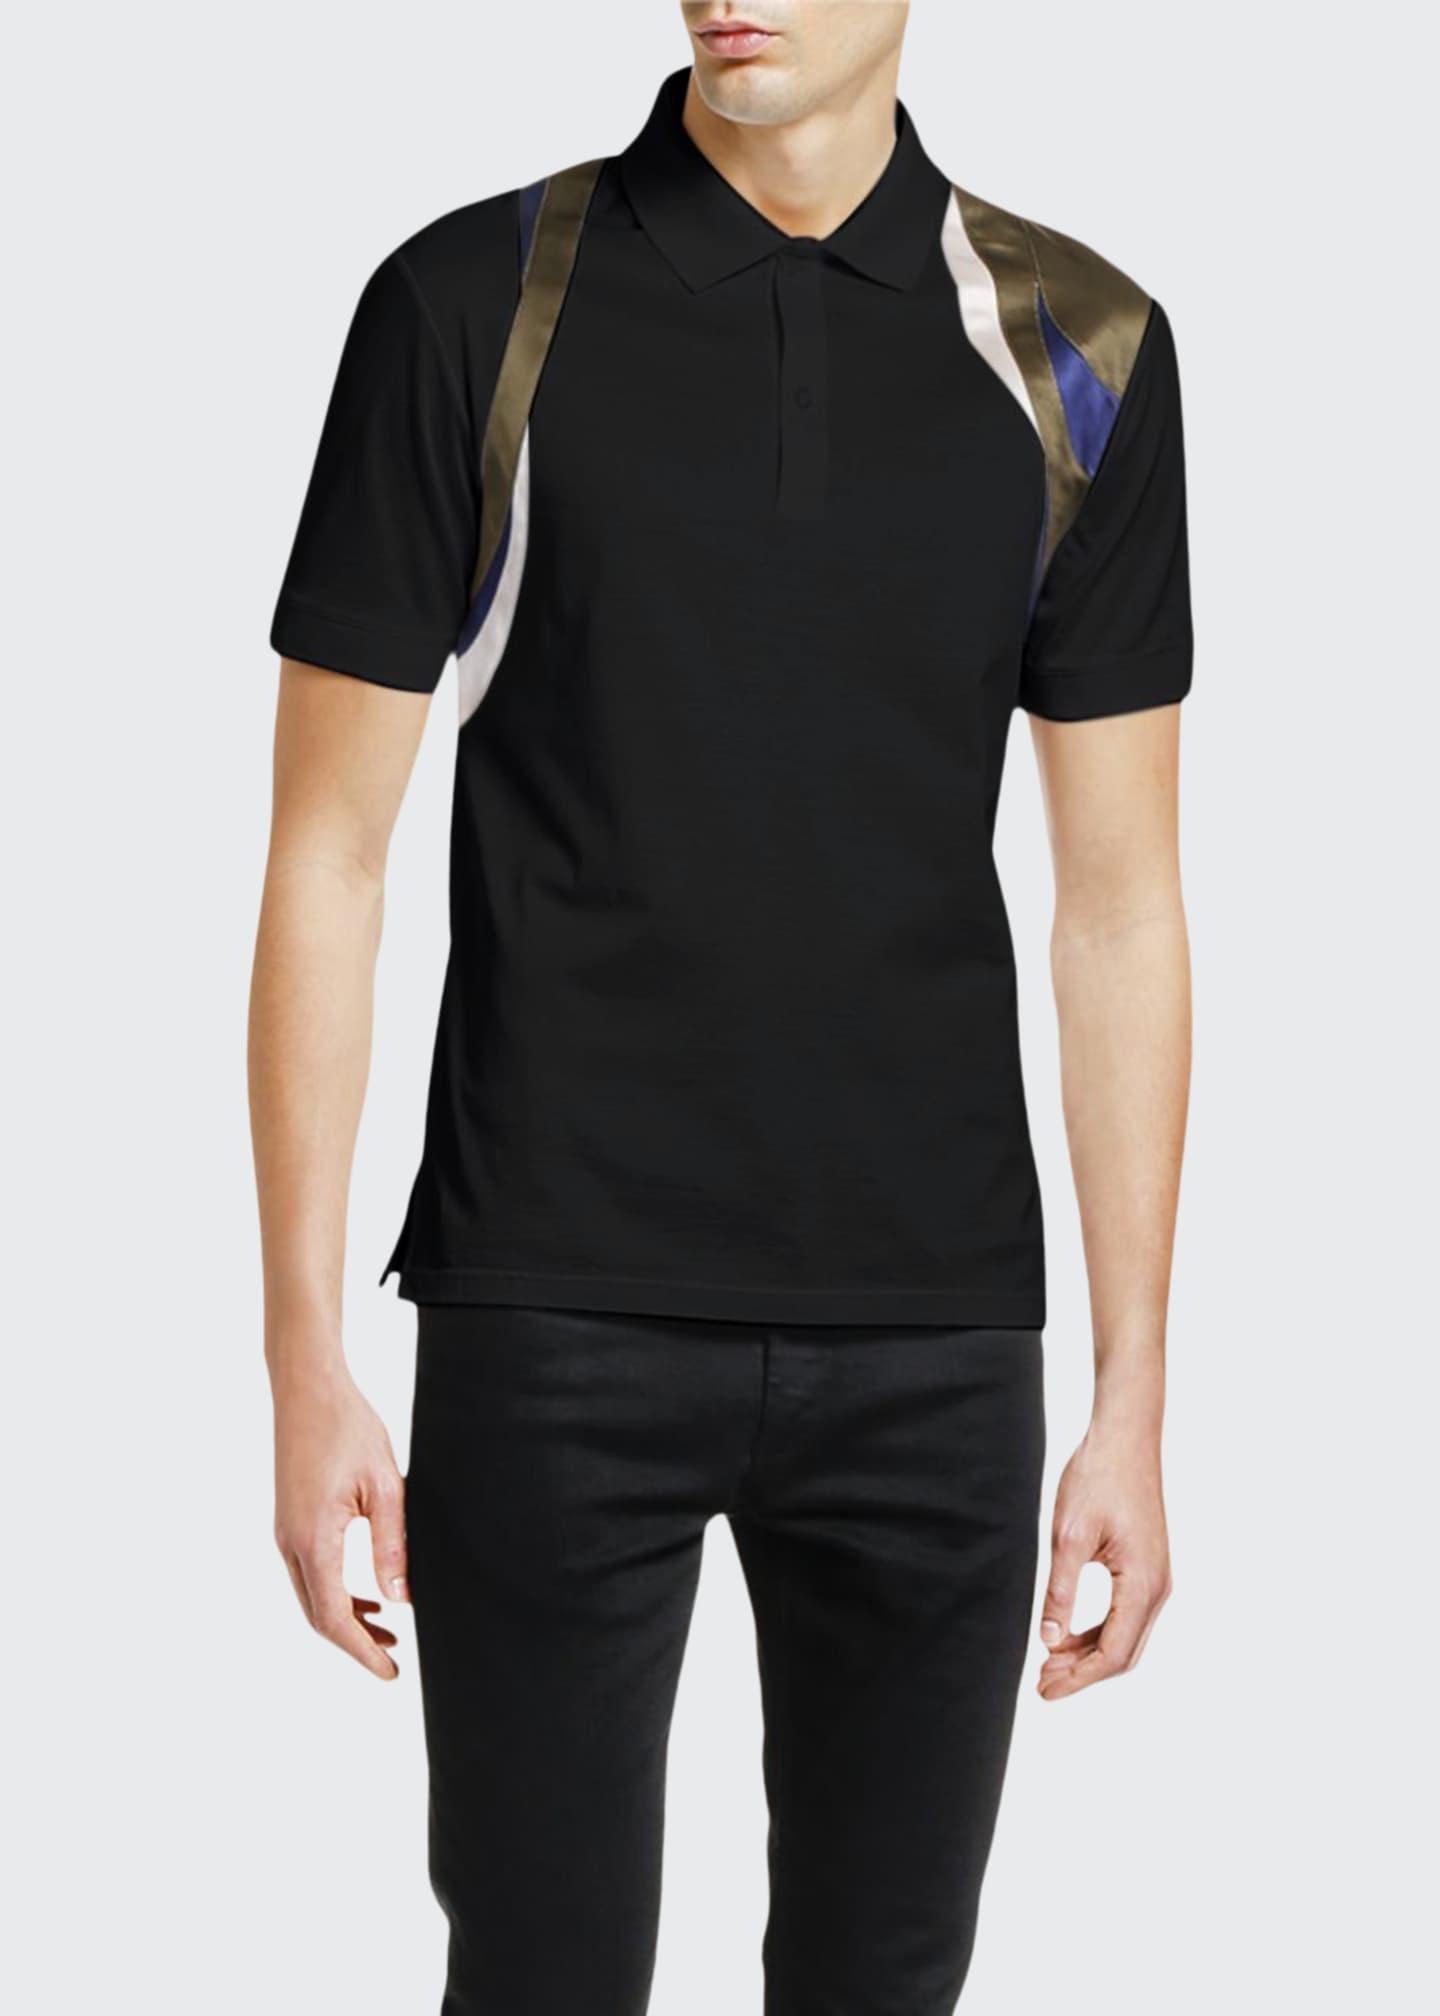 Alexander McQueen Men's Harness Polo Shirt